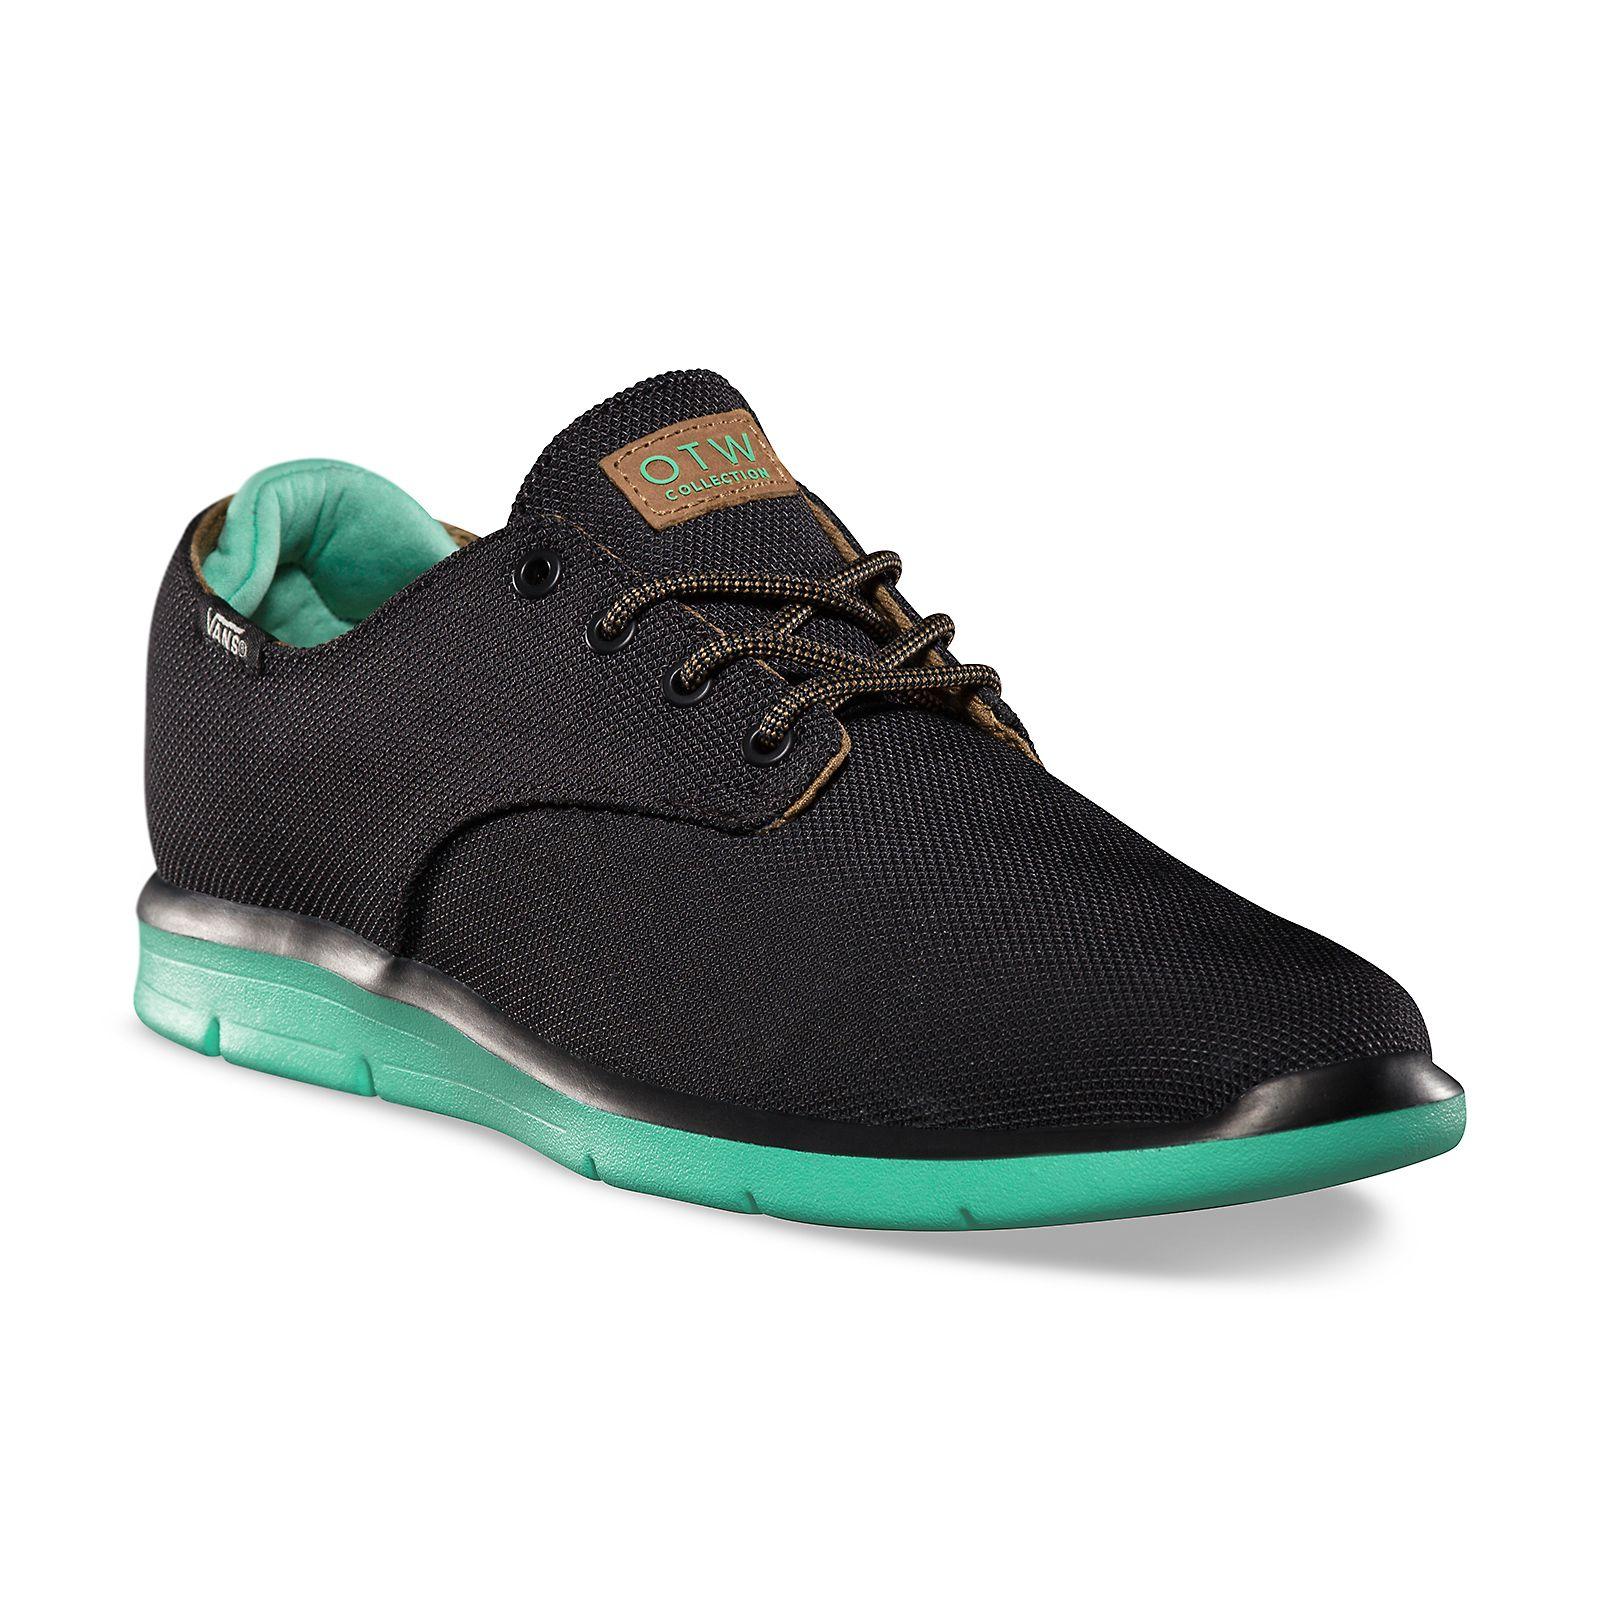 07120c48b9 Vans Prelow Ballistic Green Sneakers